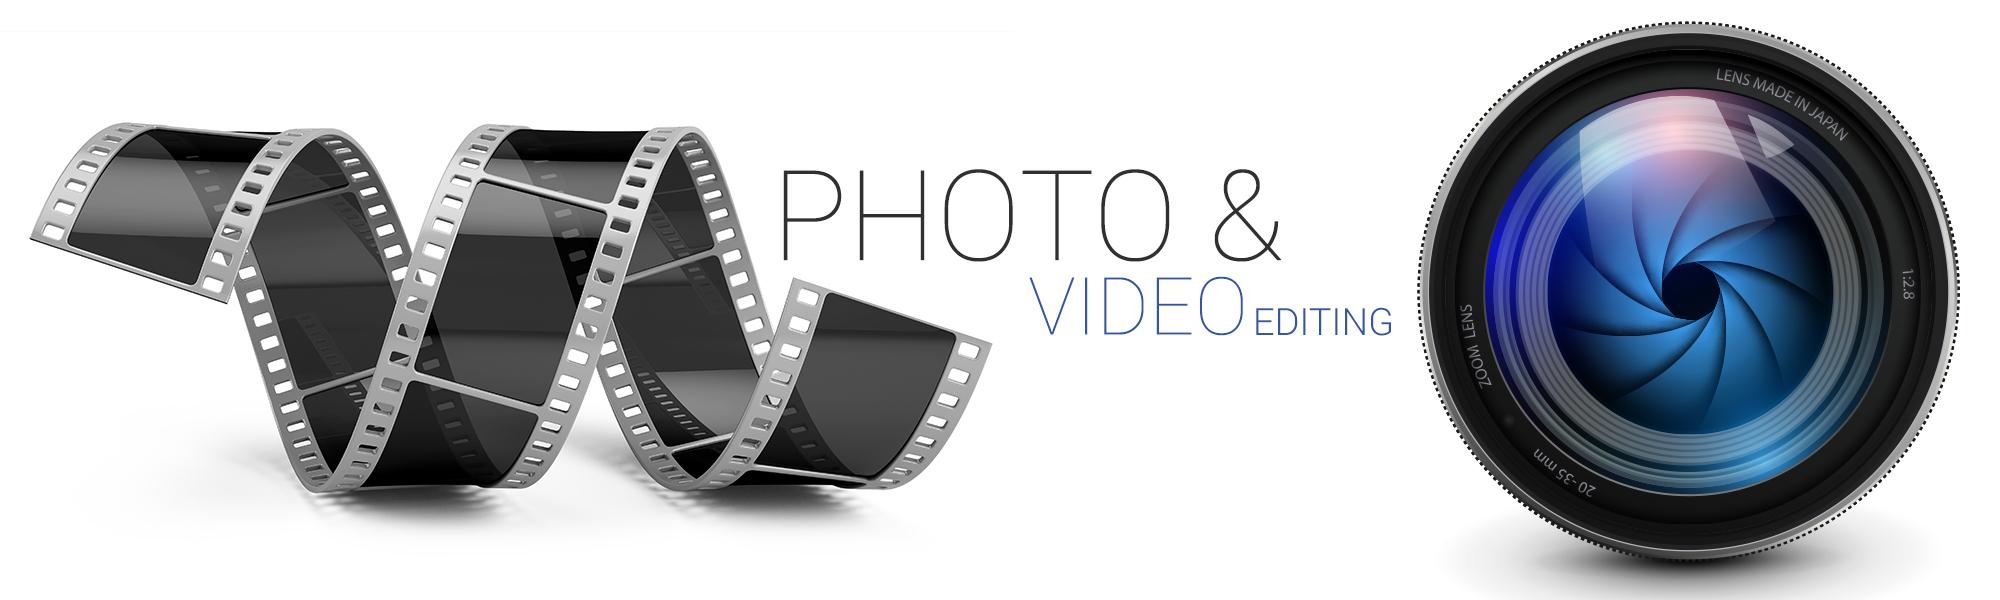 Best Photo editing websites reviews